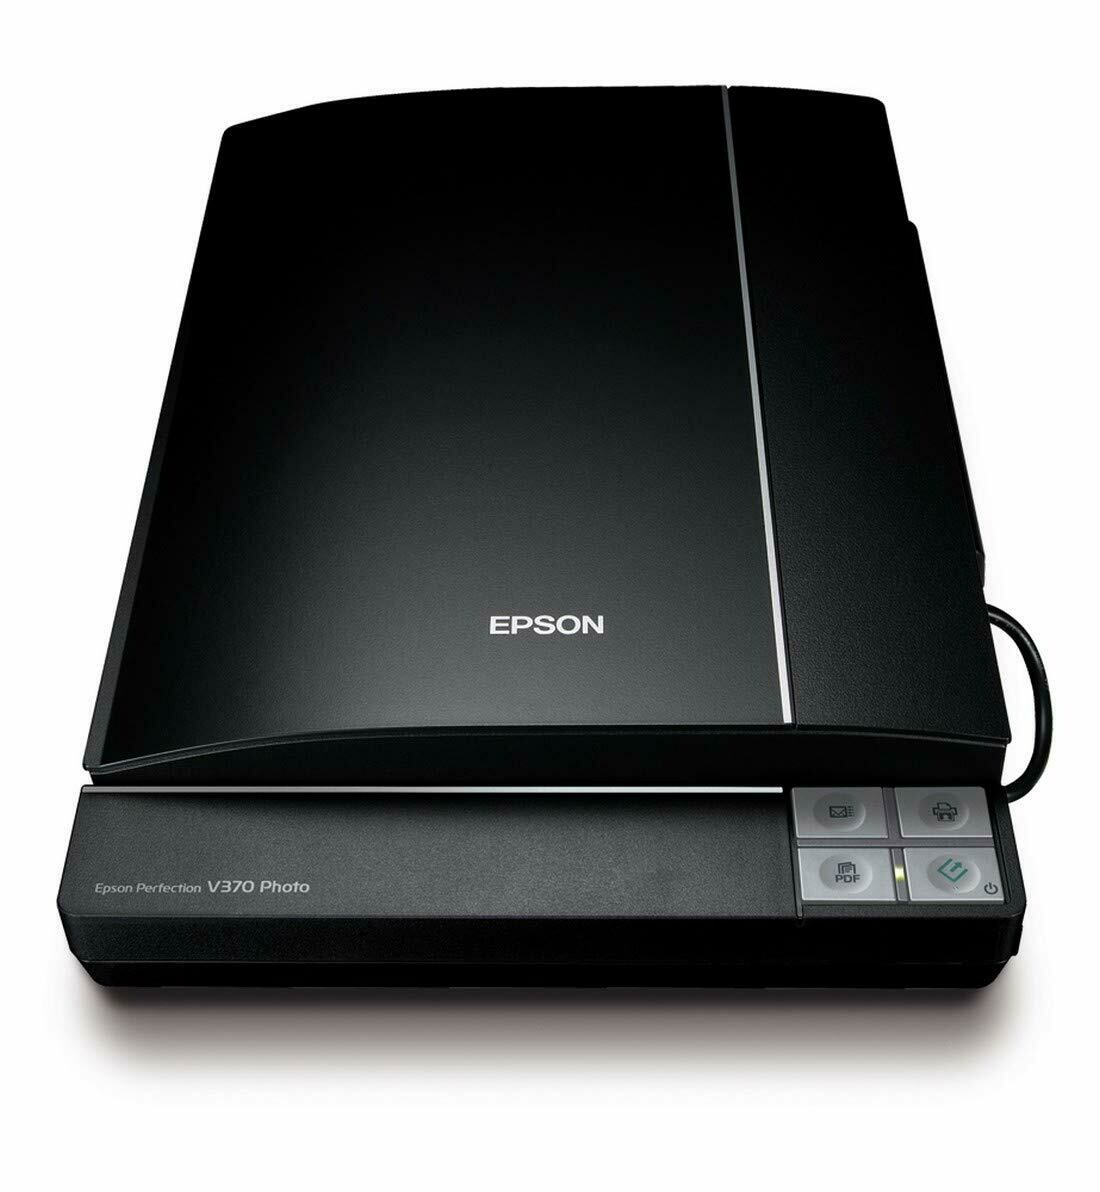 Epson Perfection V370 Color Image Scanner